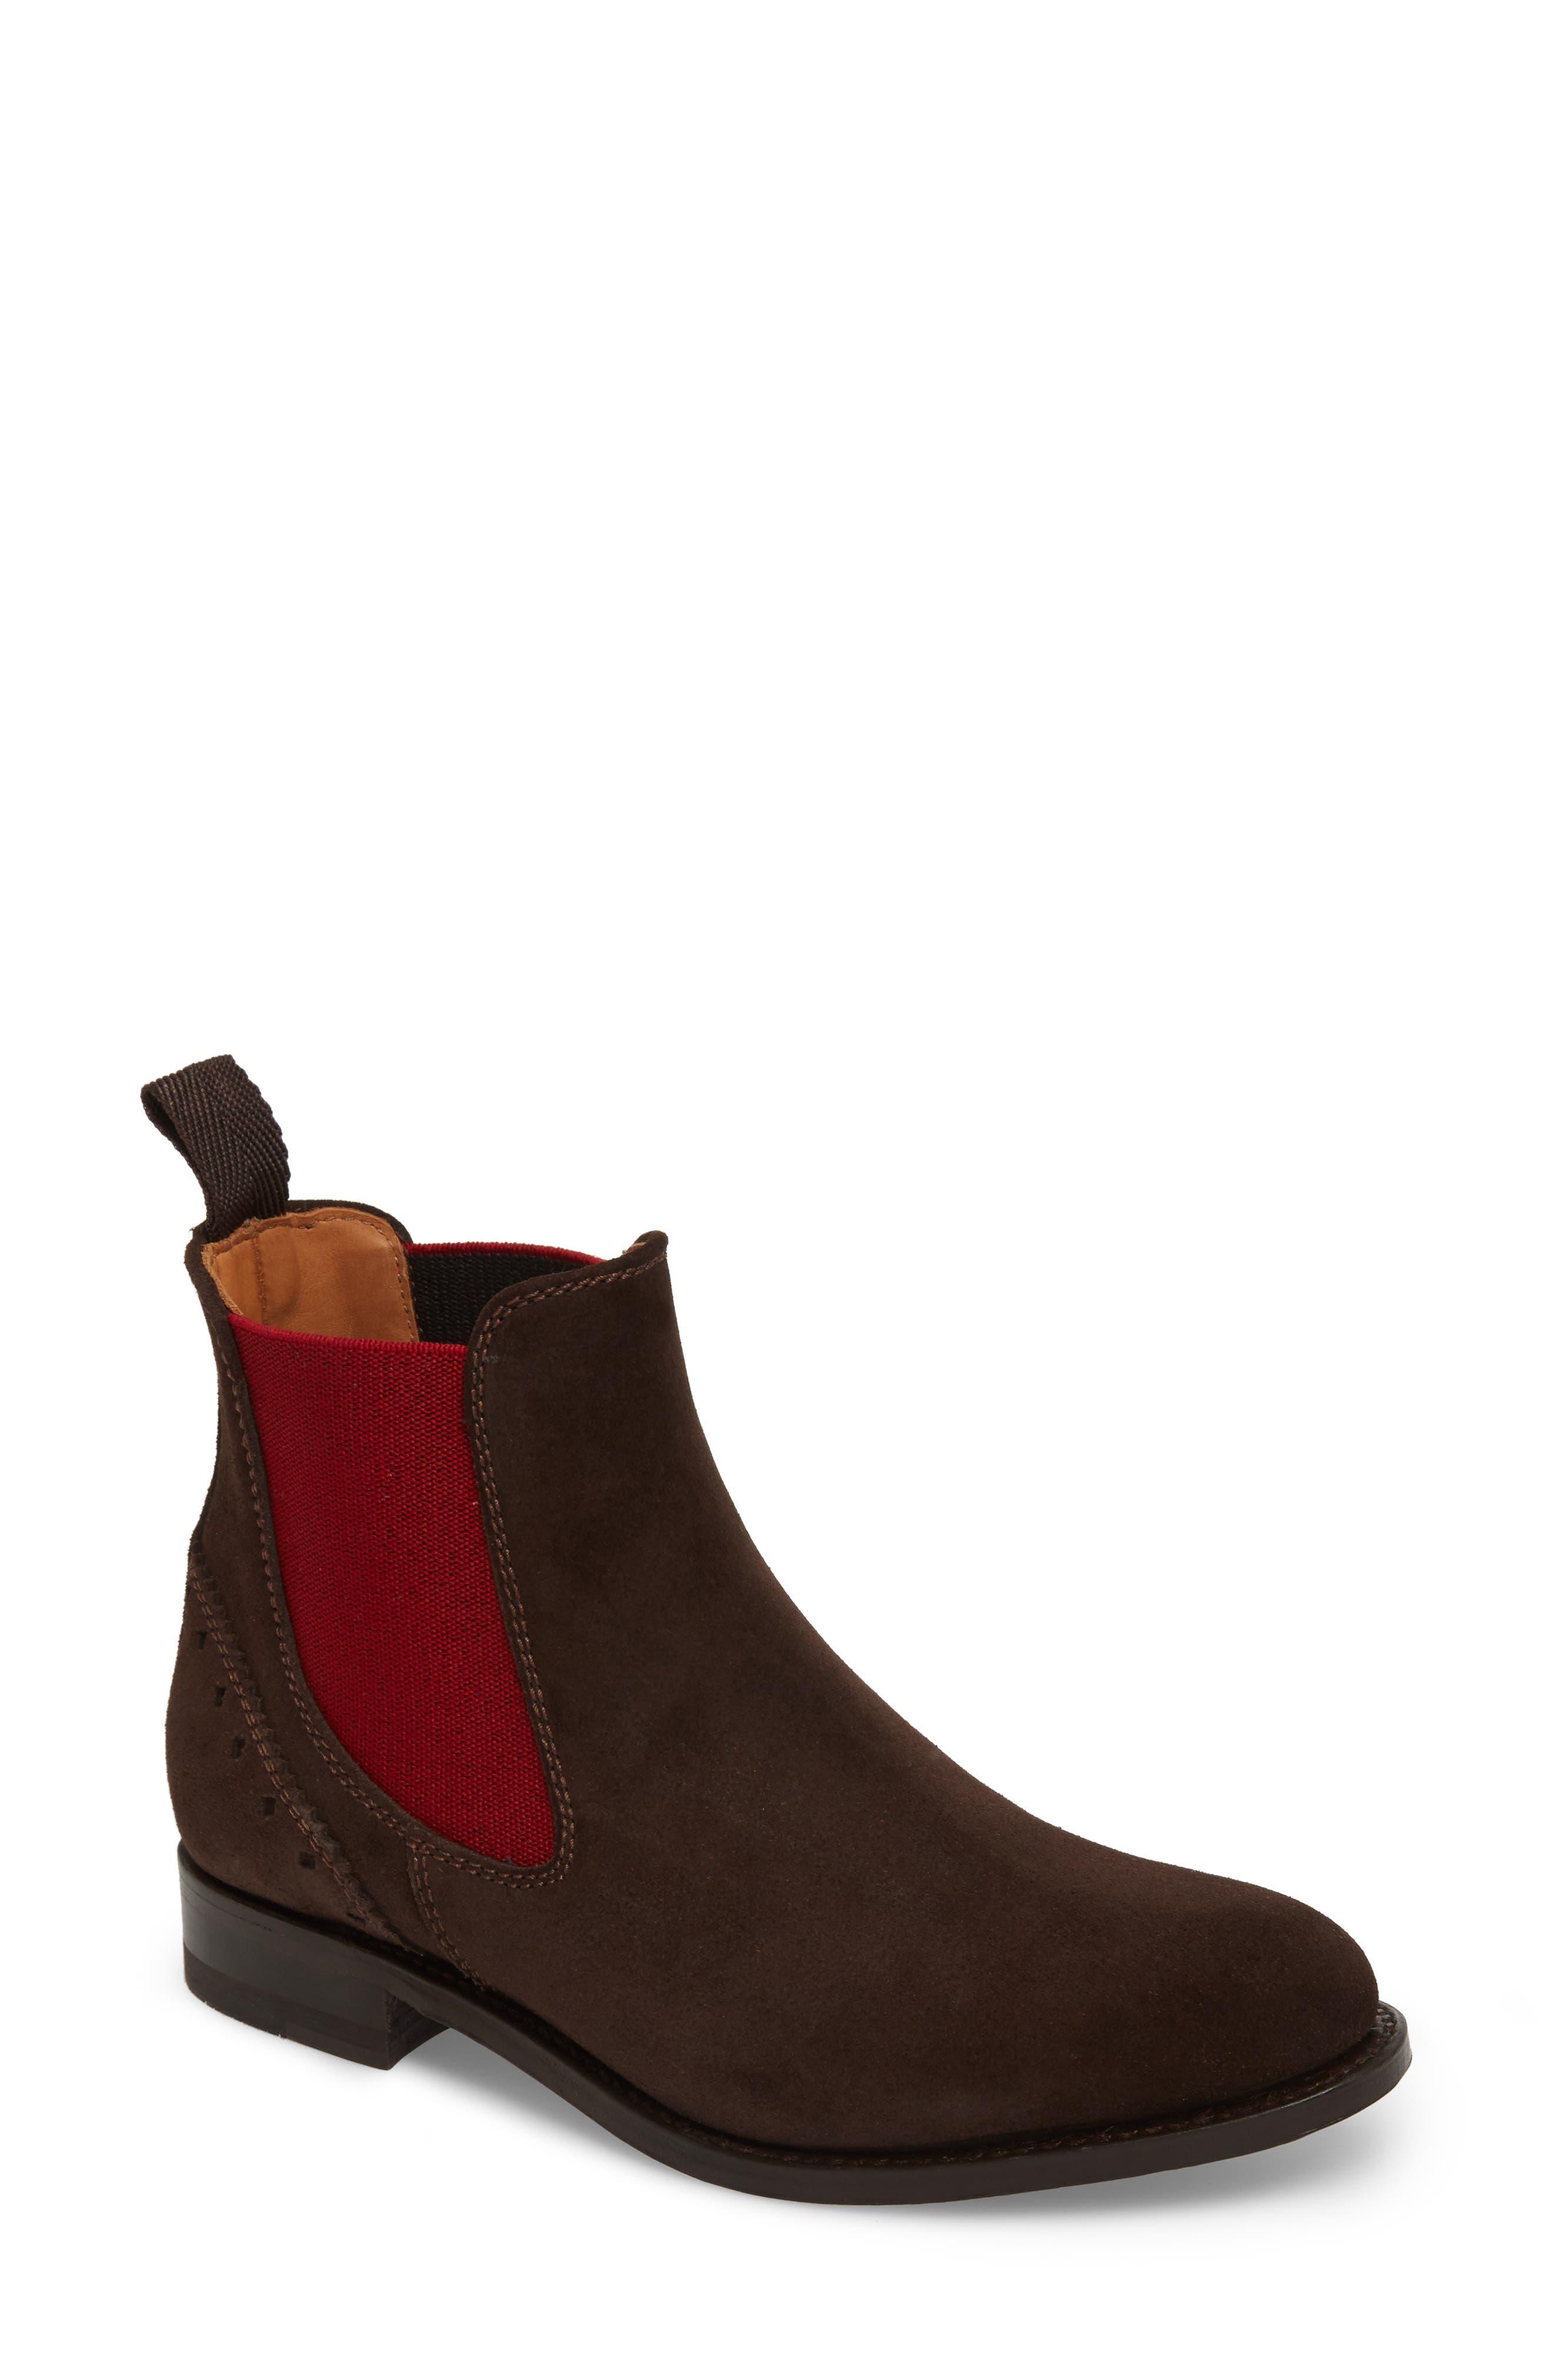 Benissa Lux Chelsea Boot,                         Main,                         color,